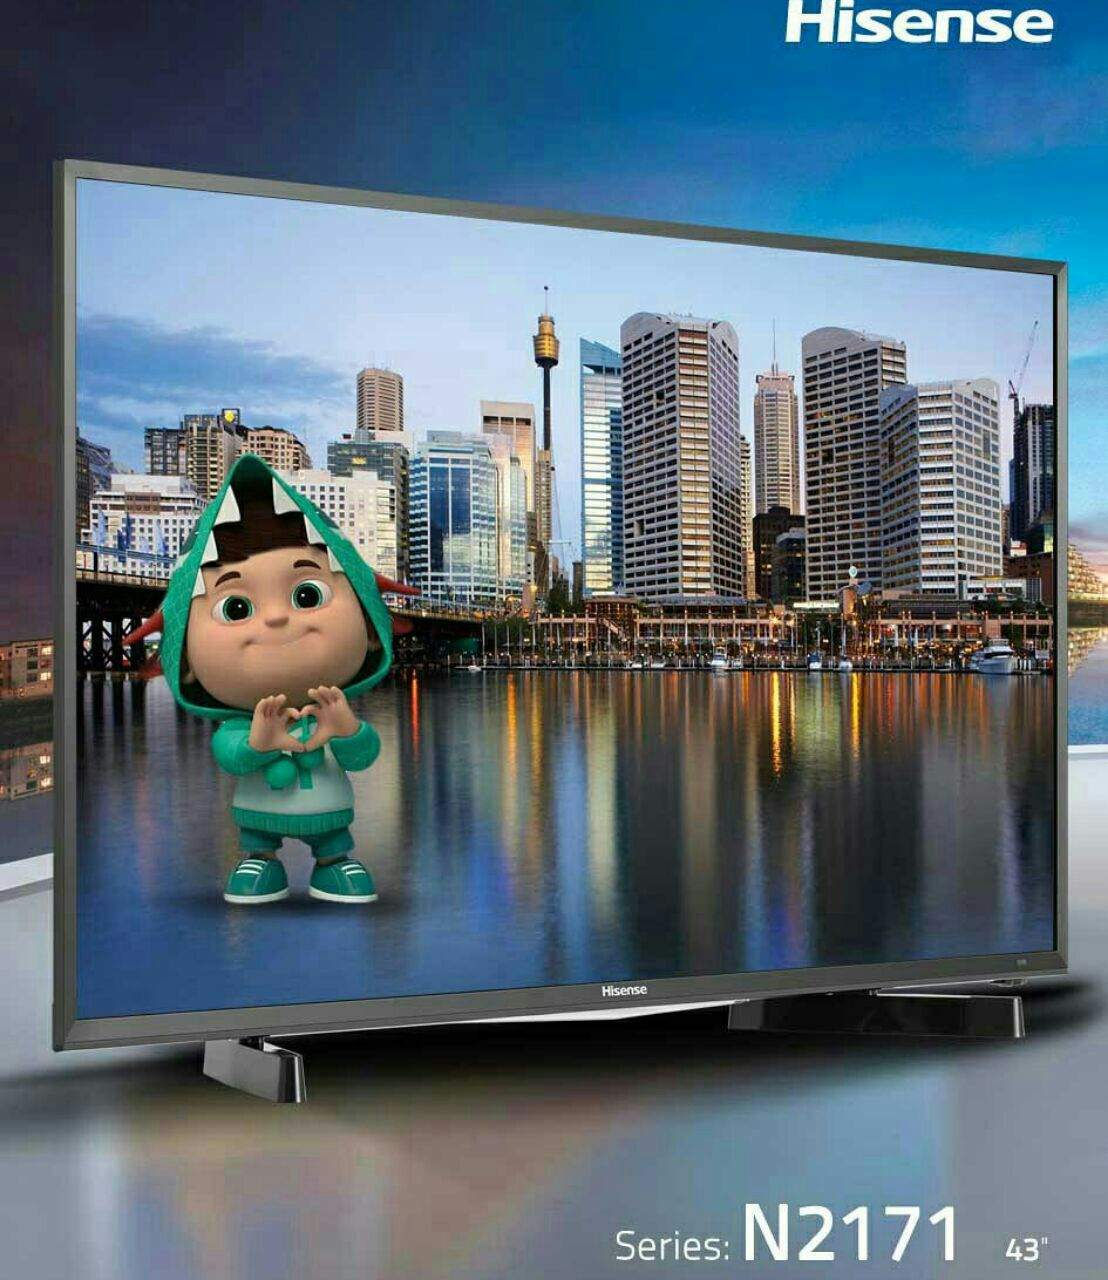 تلویزیون ال ای دی هایسنس hisense سایز 43 اینچ سری N2171